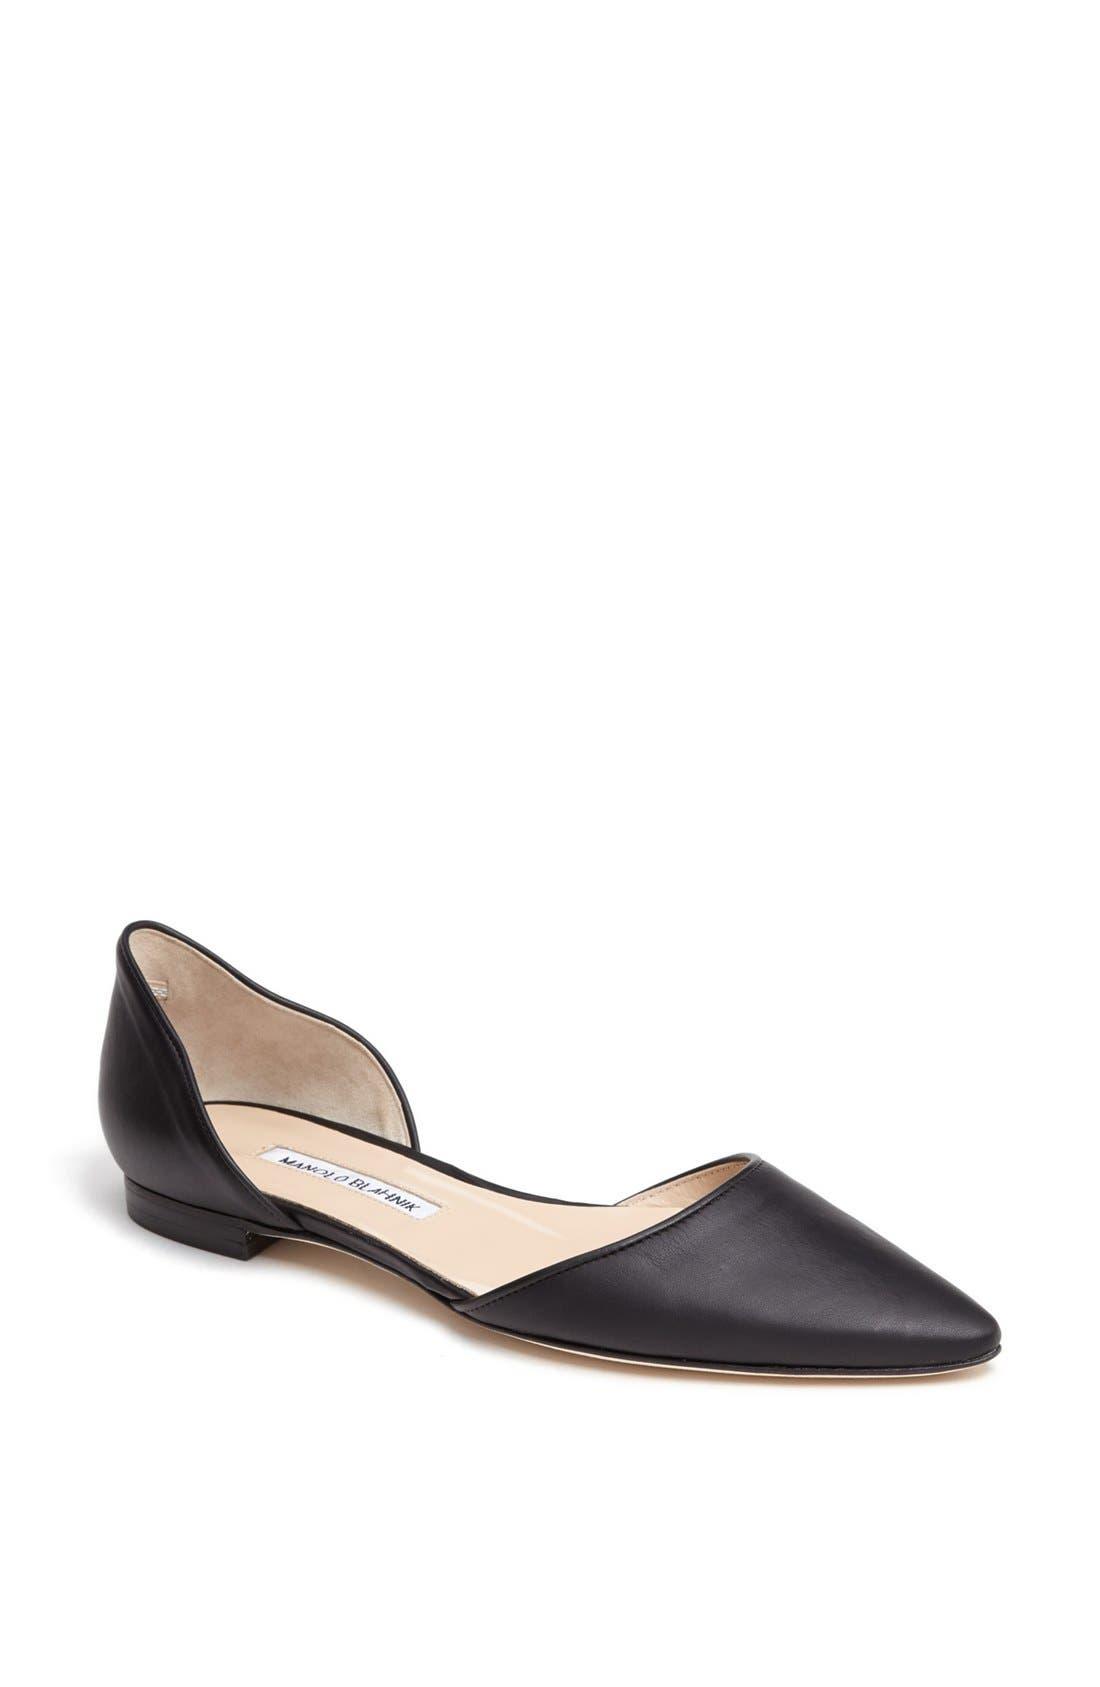 Alternate Image 1 Selected - Manolo Blahnik 'Soussaba' Leather Pointed Toe Flat